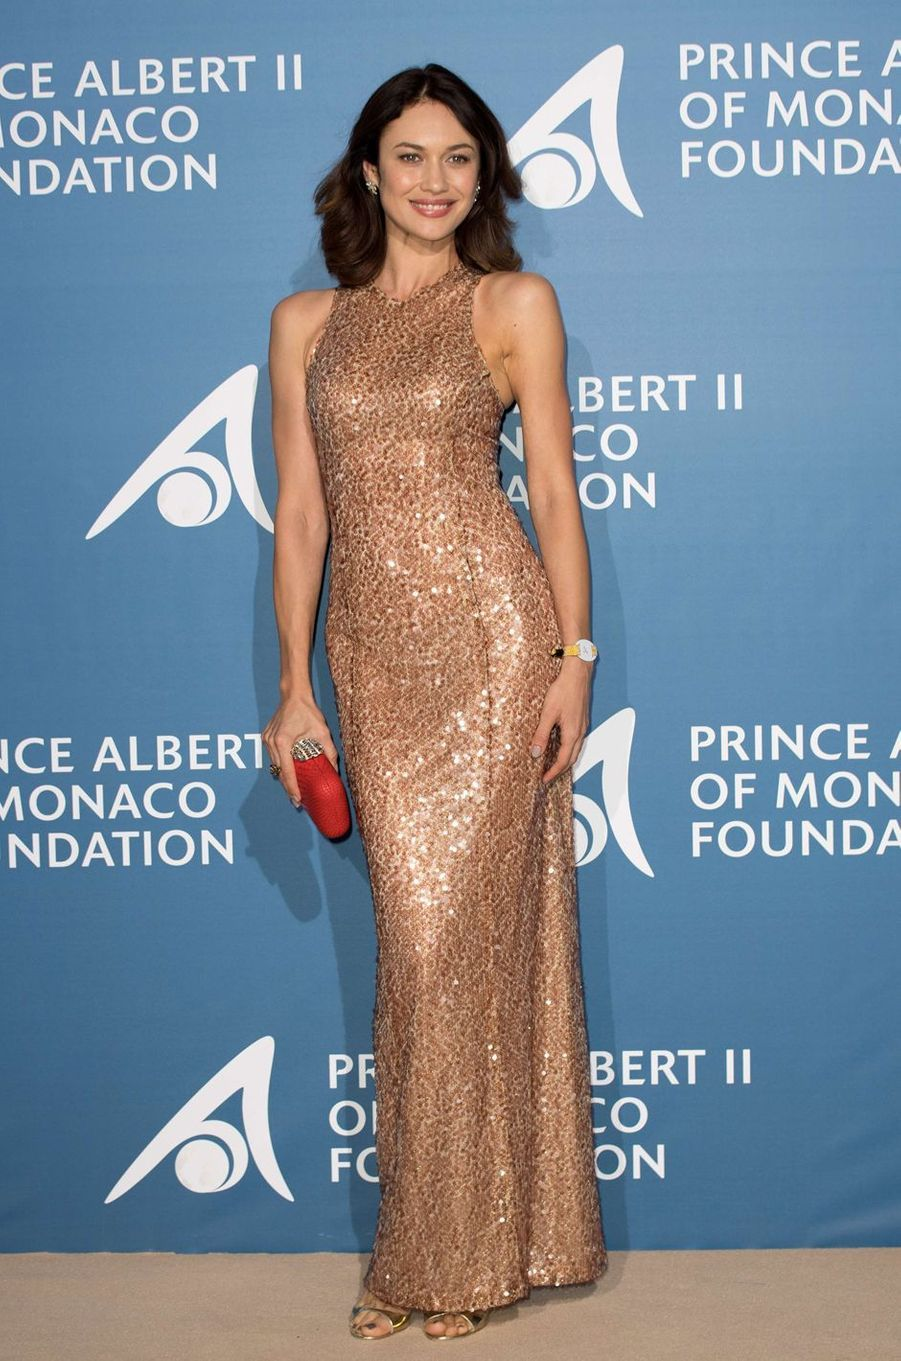 Olga Kurylenko au Monte-Carlo Gala pour l'Océan à Monaco, le 28 septembre 2017